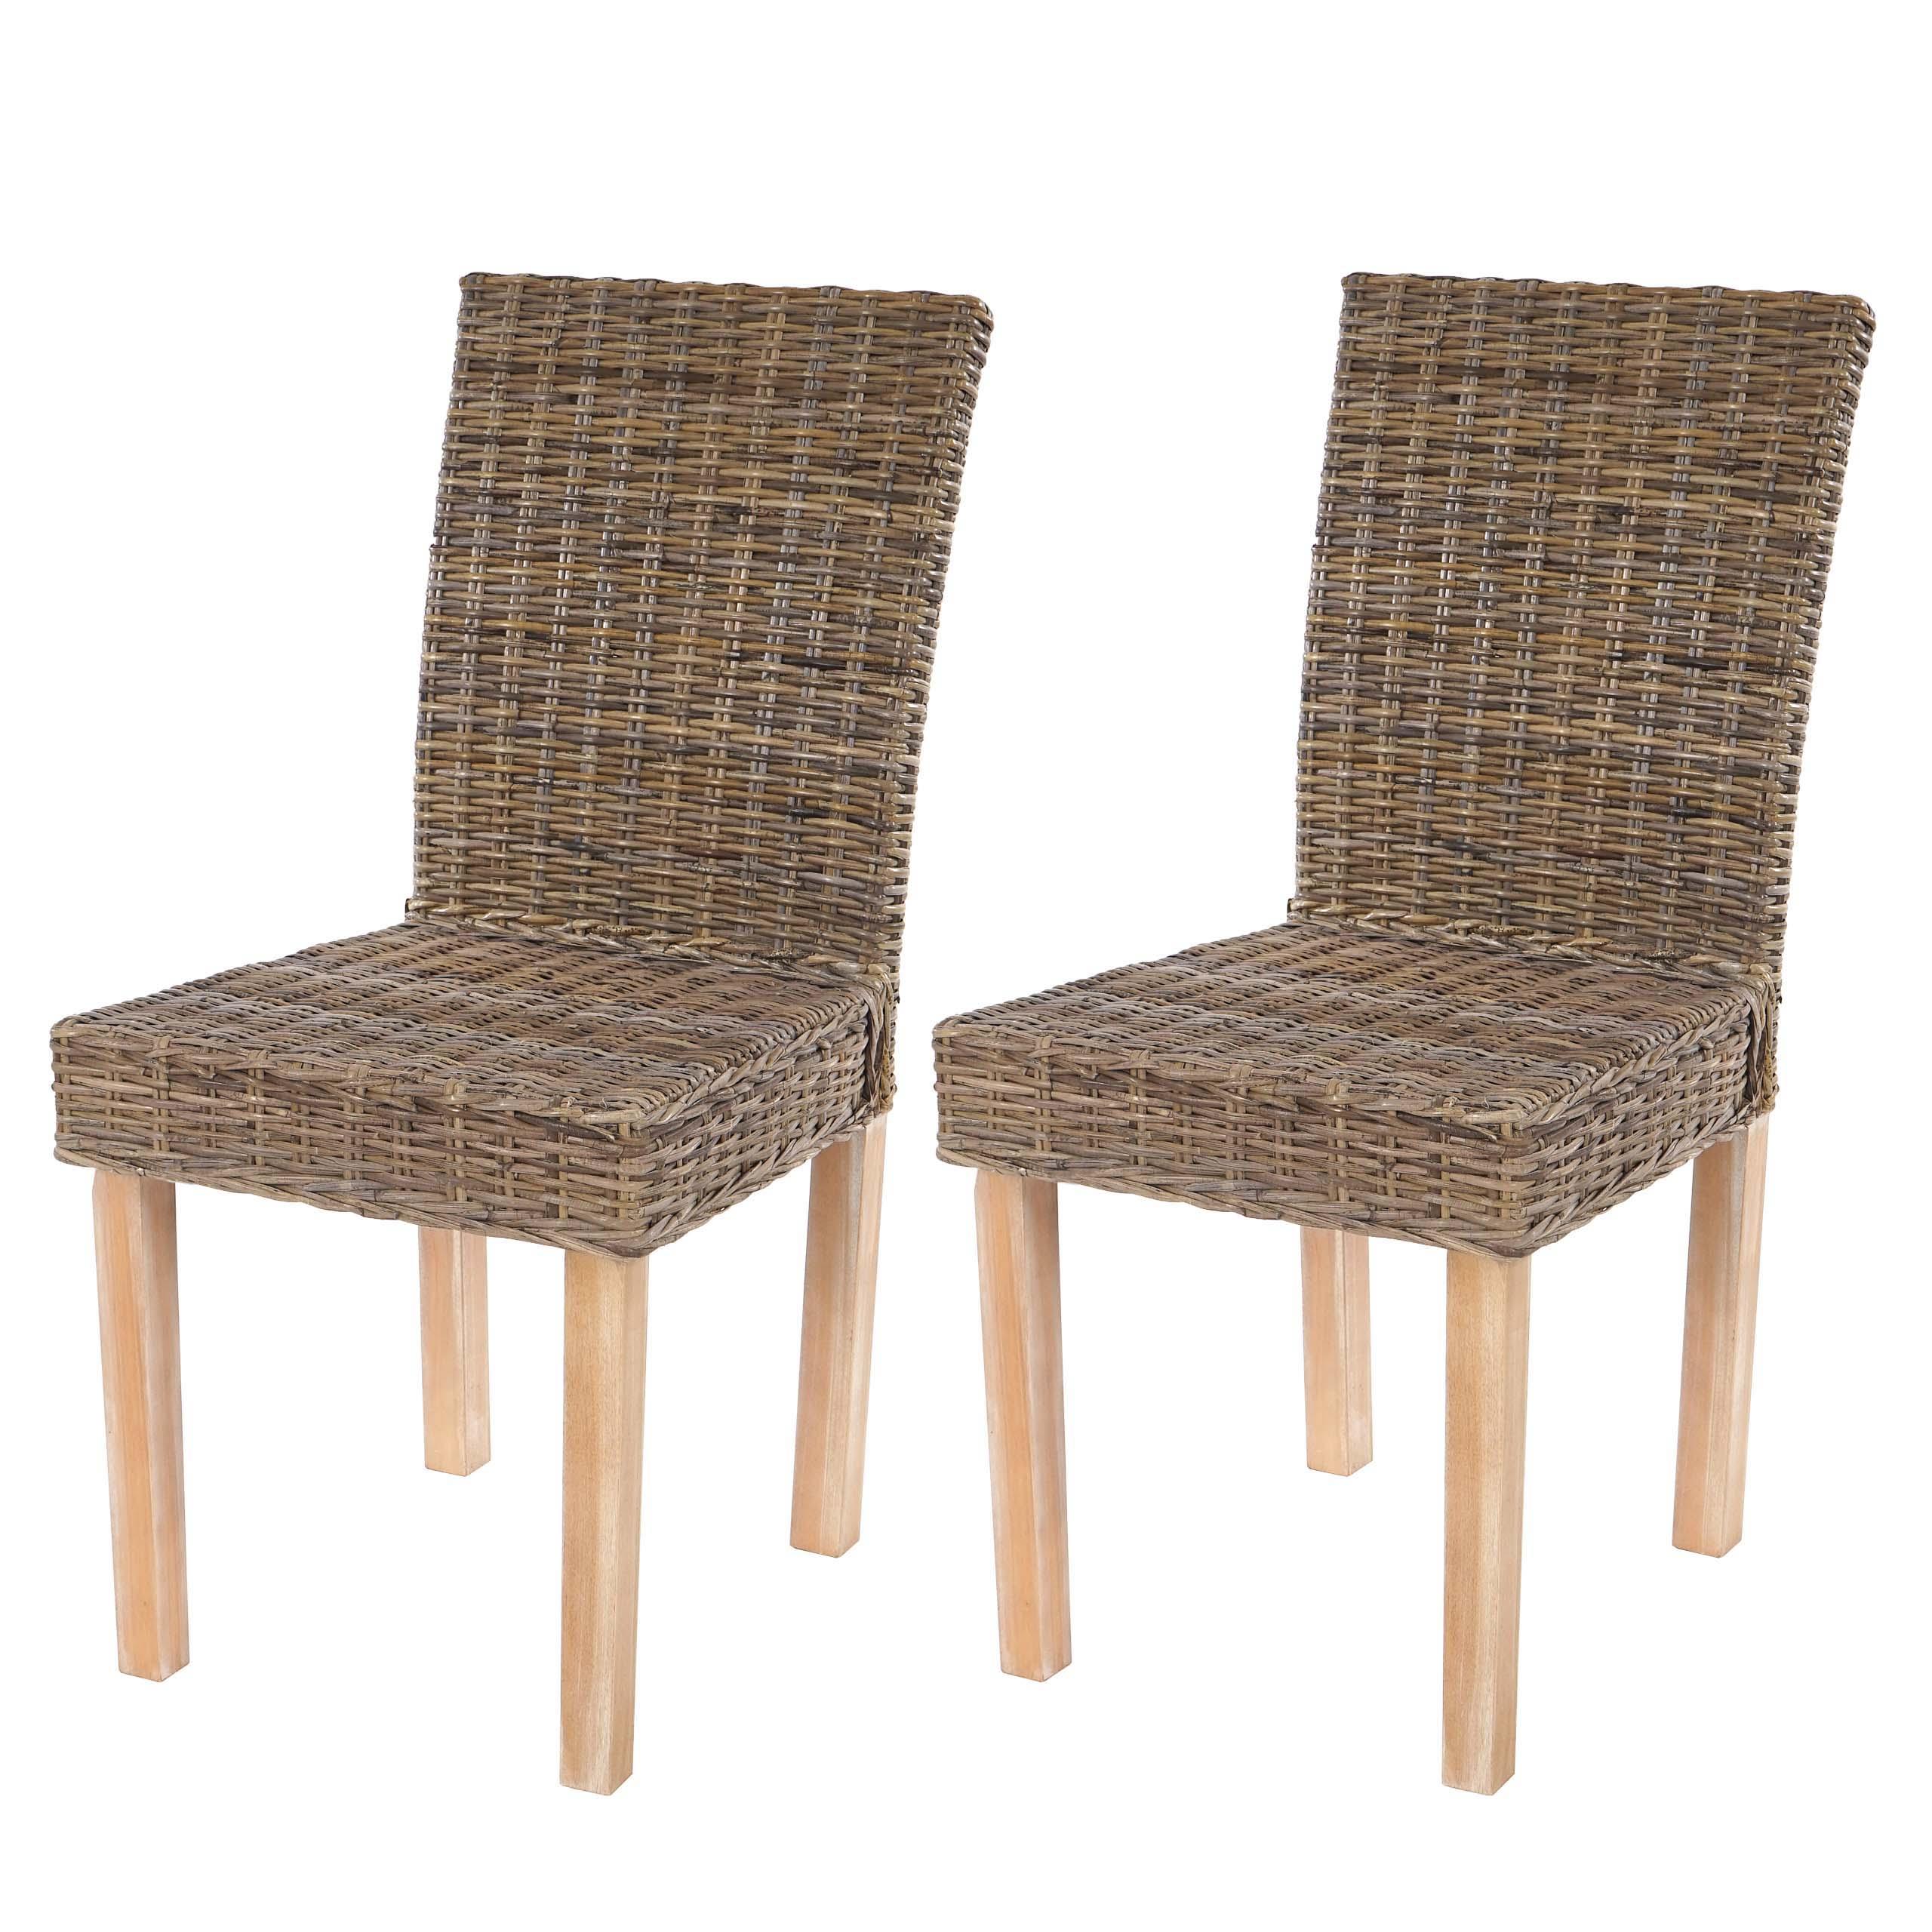 2x esszimmerstuhl littau korbstuhl stuhl lehnstuhl kubu for Chaise salle a manger en kubu